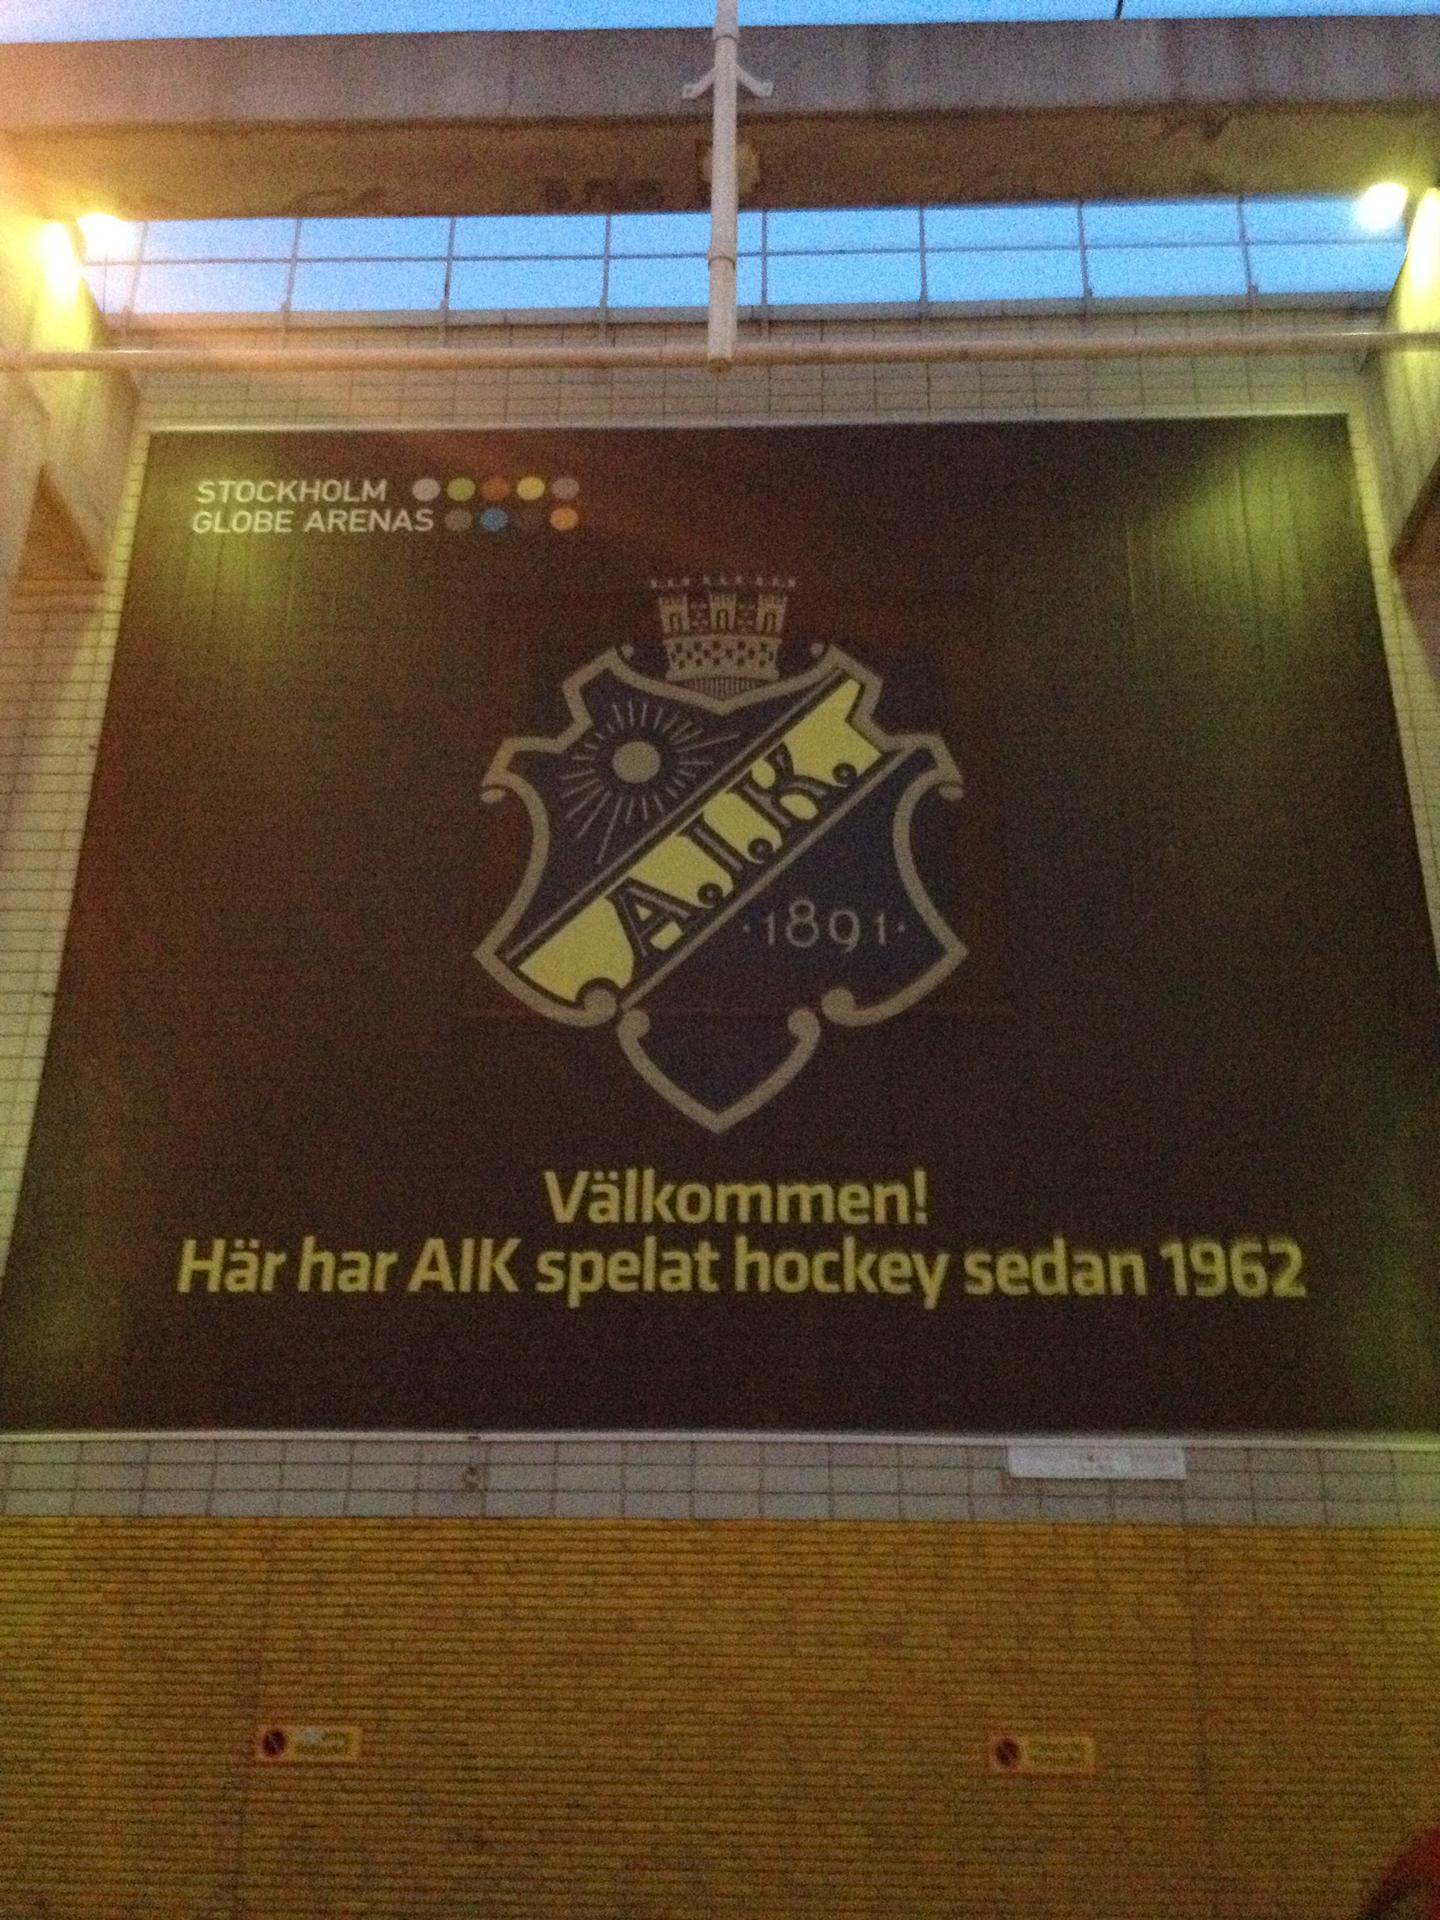 Allmänna Idrottsklubben Ishockeyförening (abbreviated AIK Hockey, or simply AIK), is the ice hockey section of sports club Allmänna Idrottsklubben based in Stockholm, Sweden.